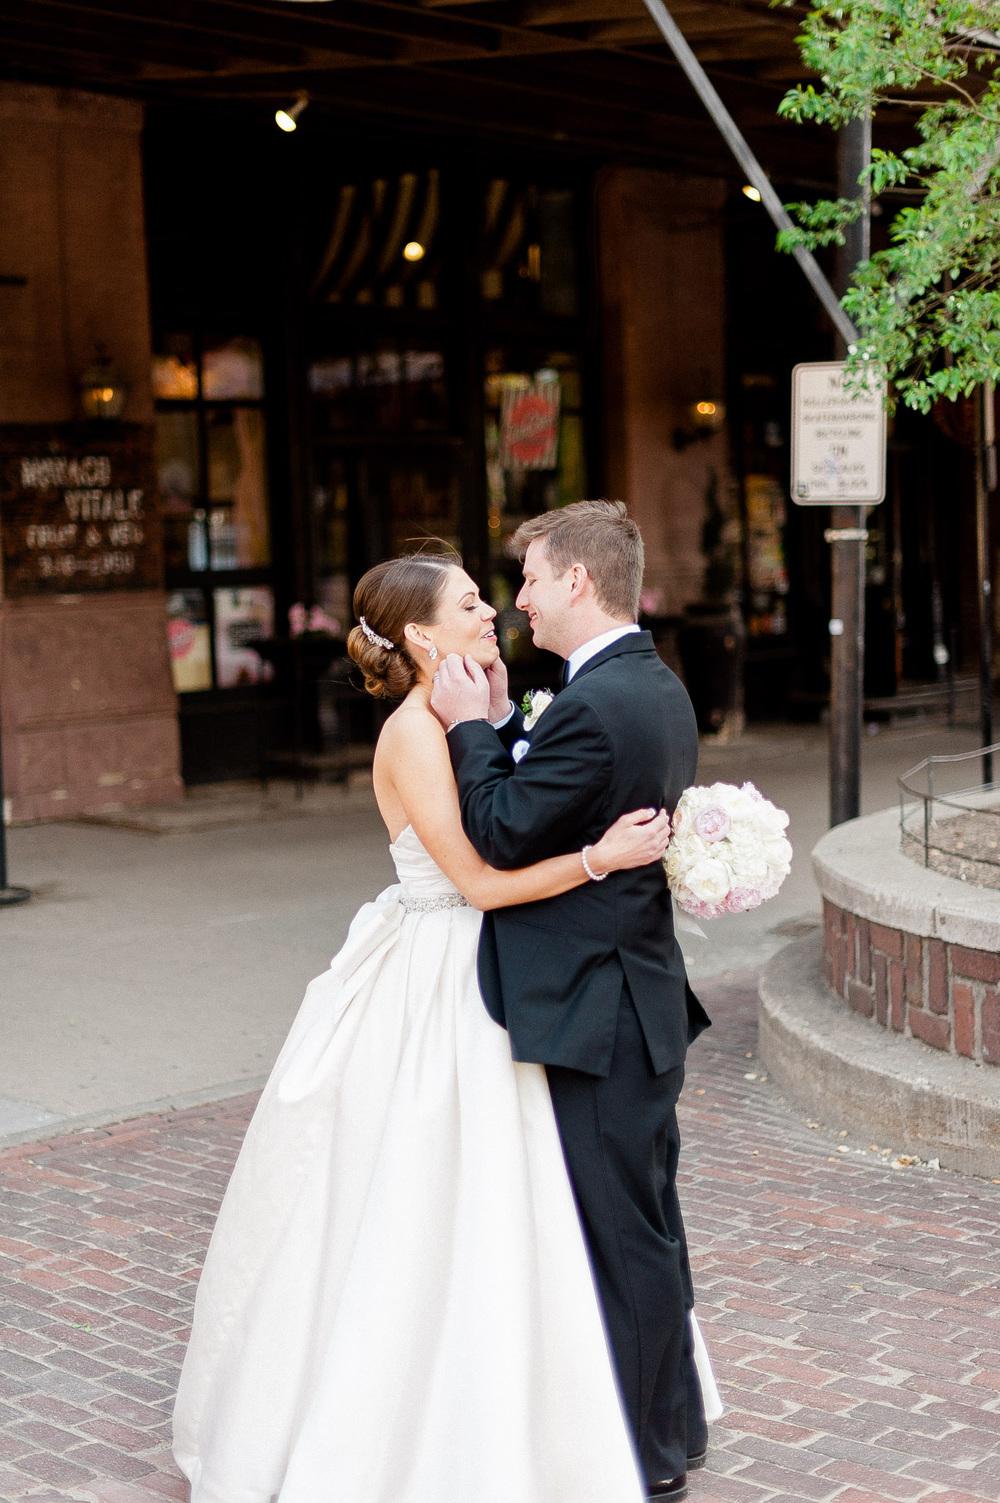 Alyson and Tom Wedding Blog-40.jpg